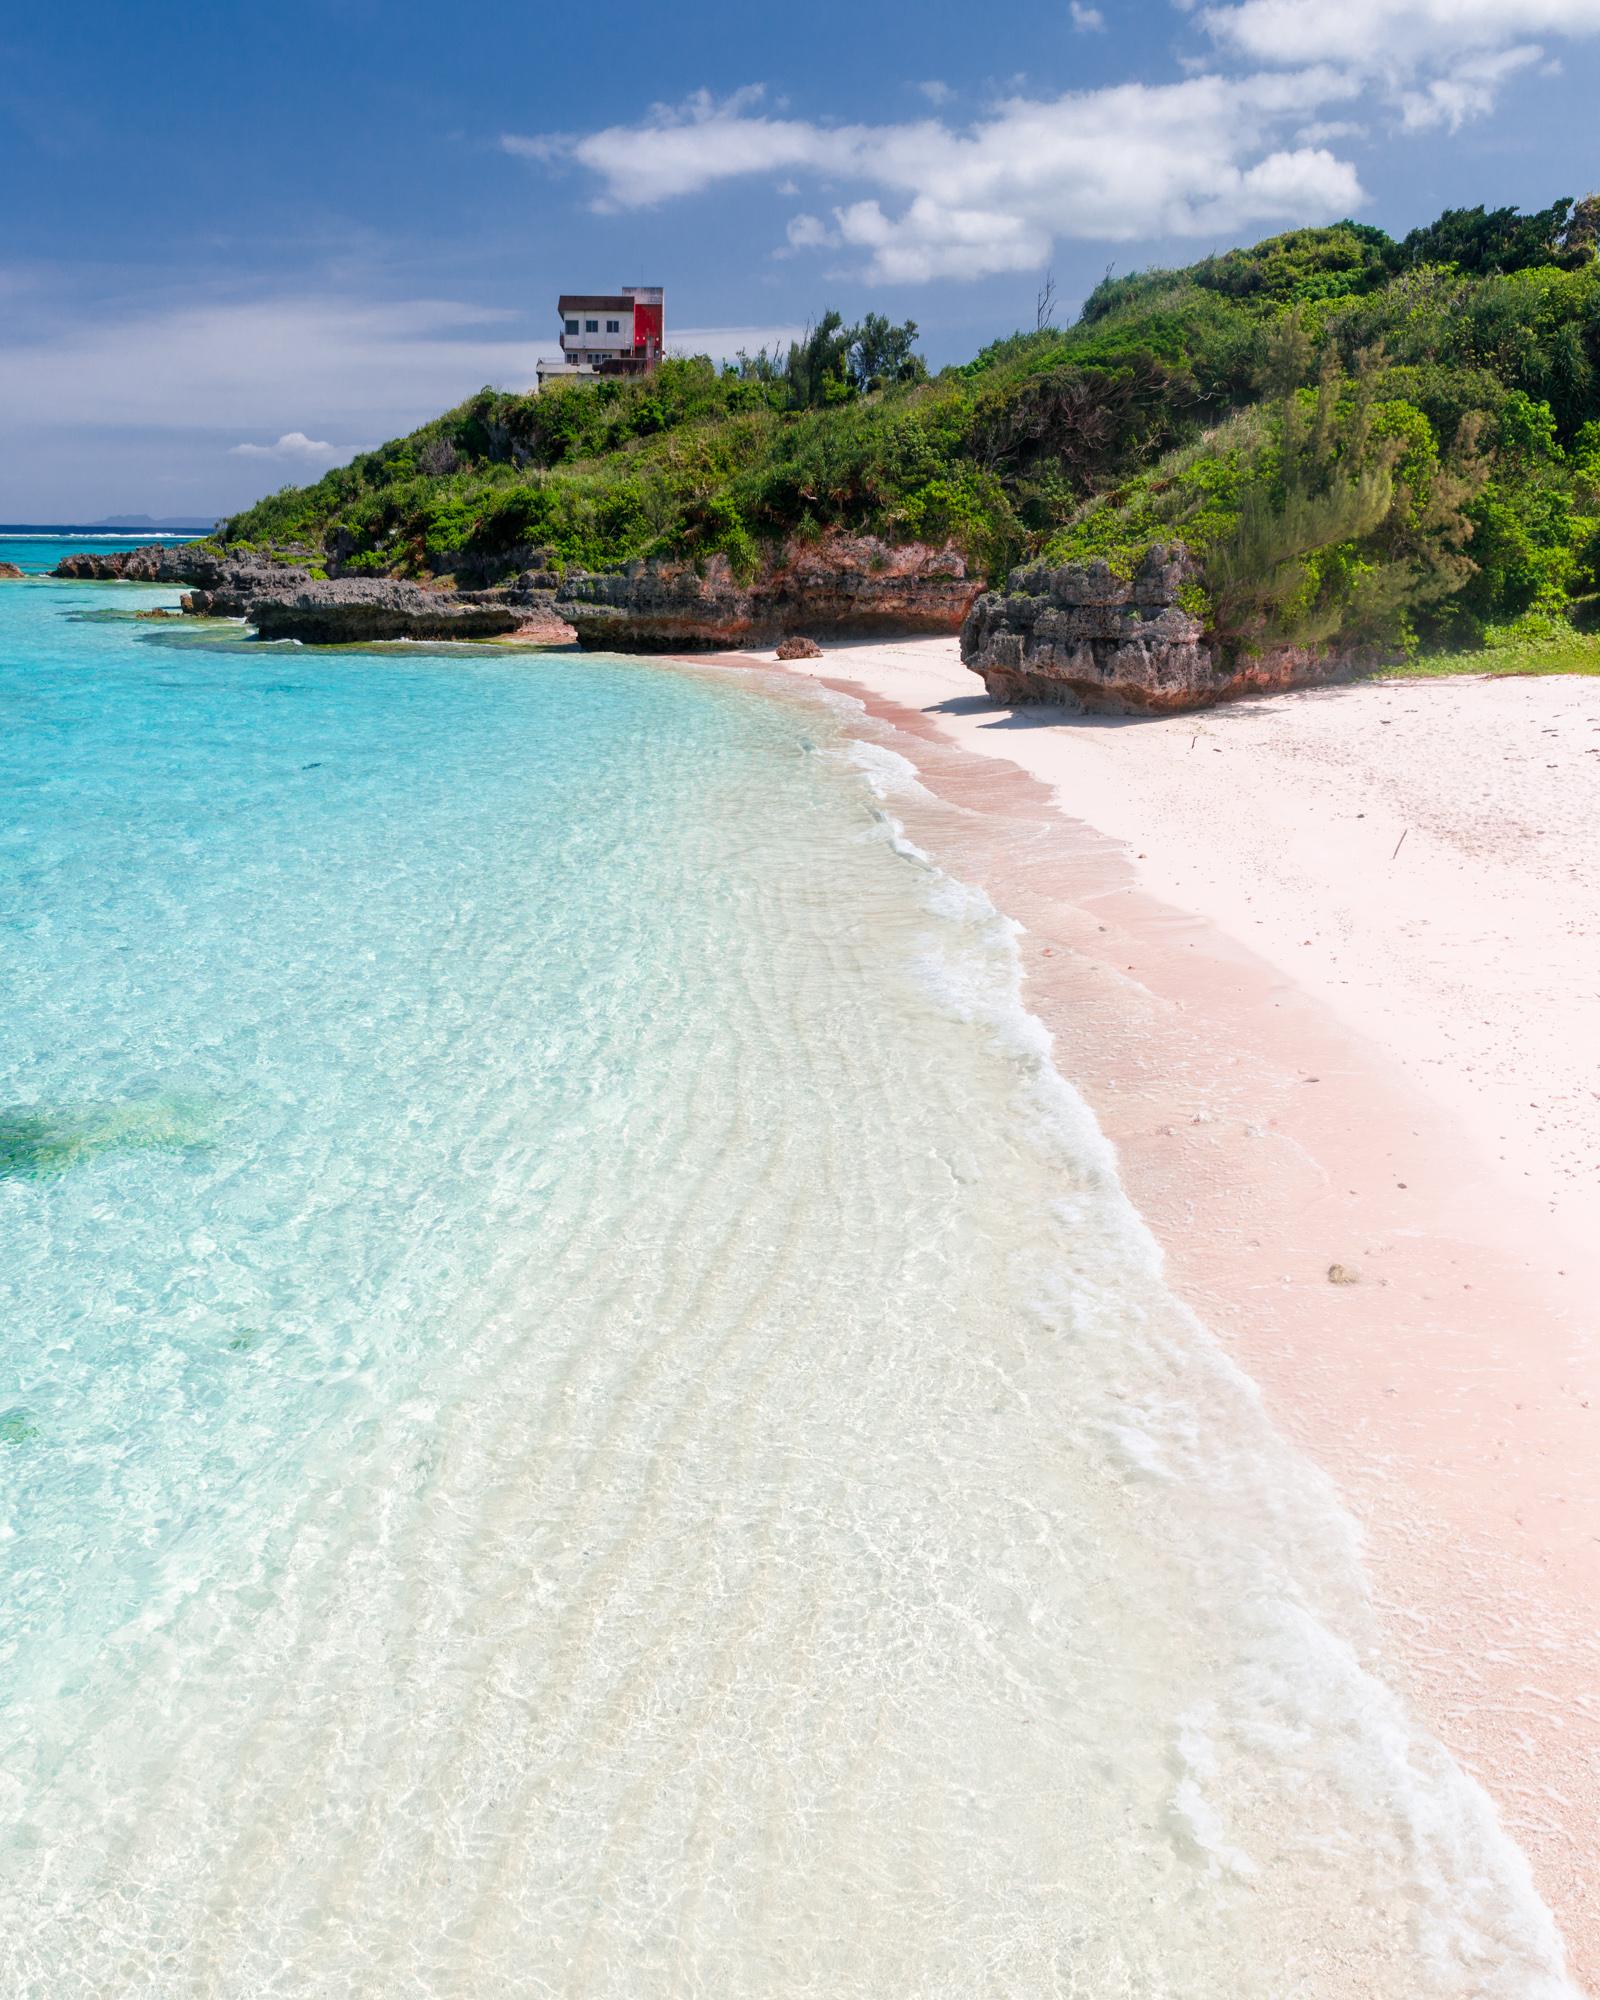 Okinawa - Japan - pinterest - Loic Lagarde -23